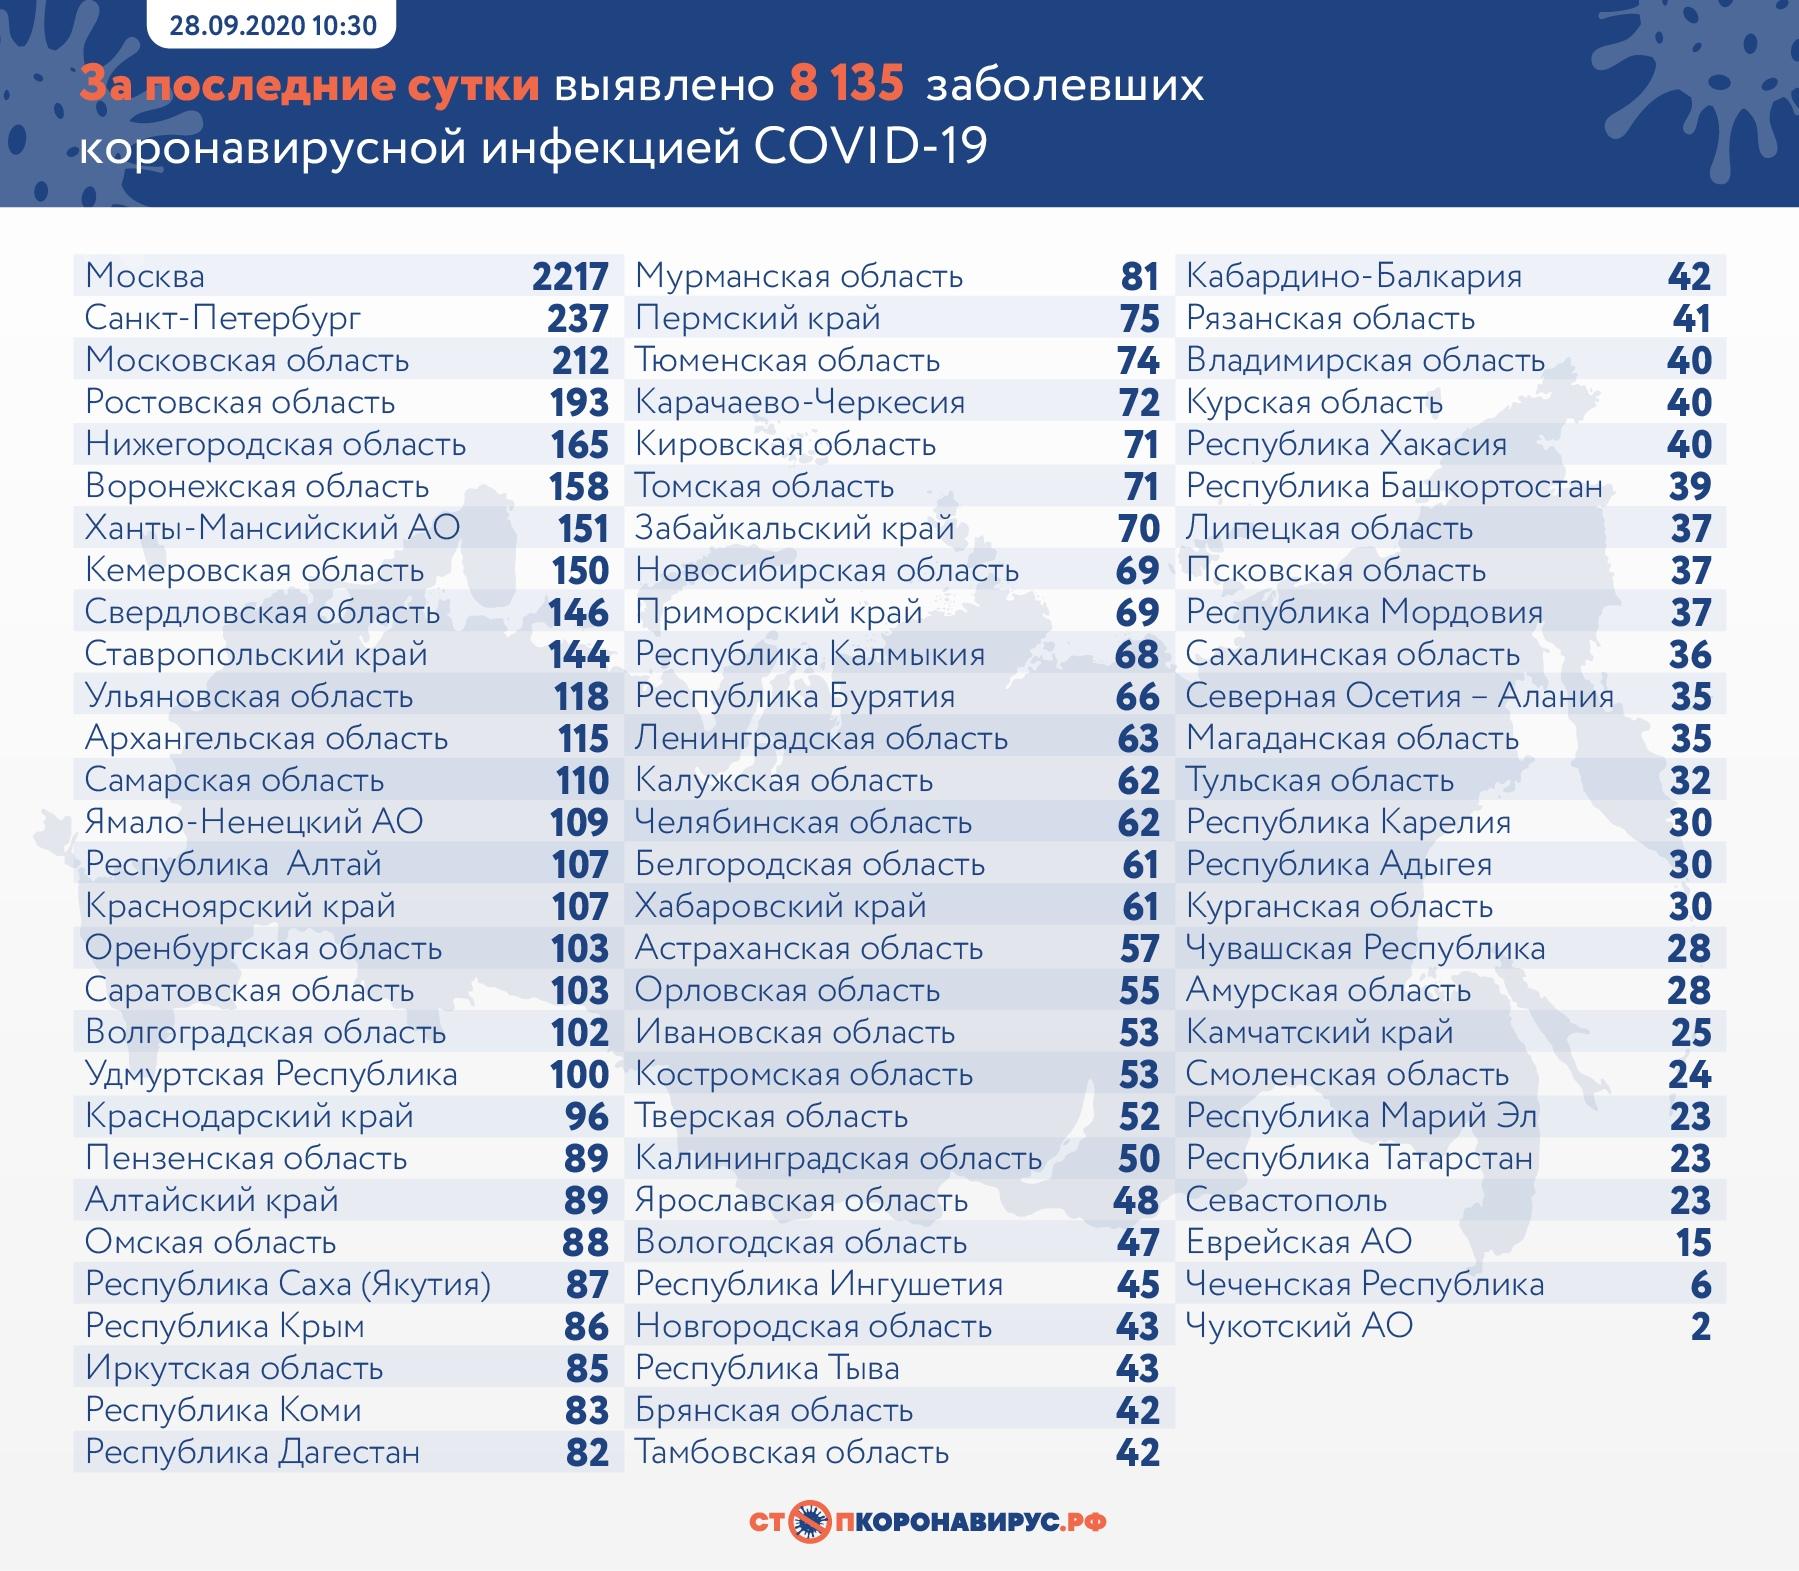 За сутки в Самарской области от коронавируса умерли 3 человека